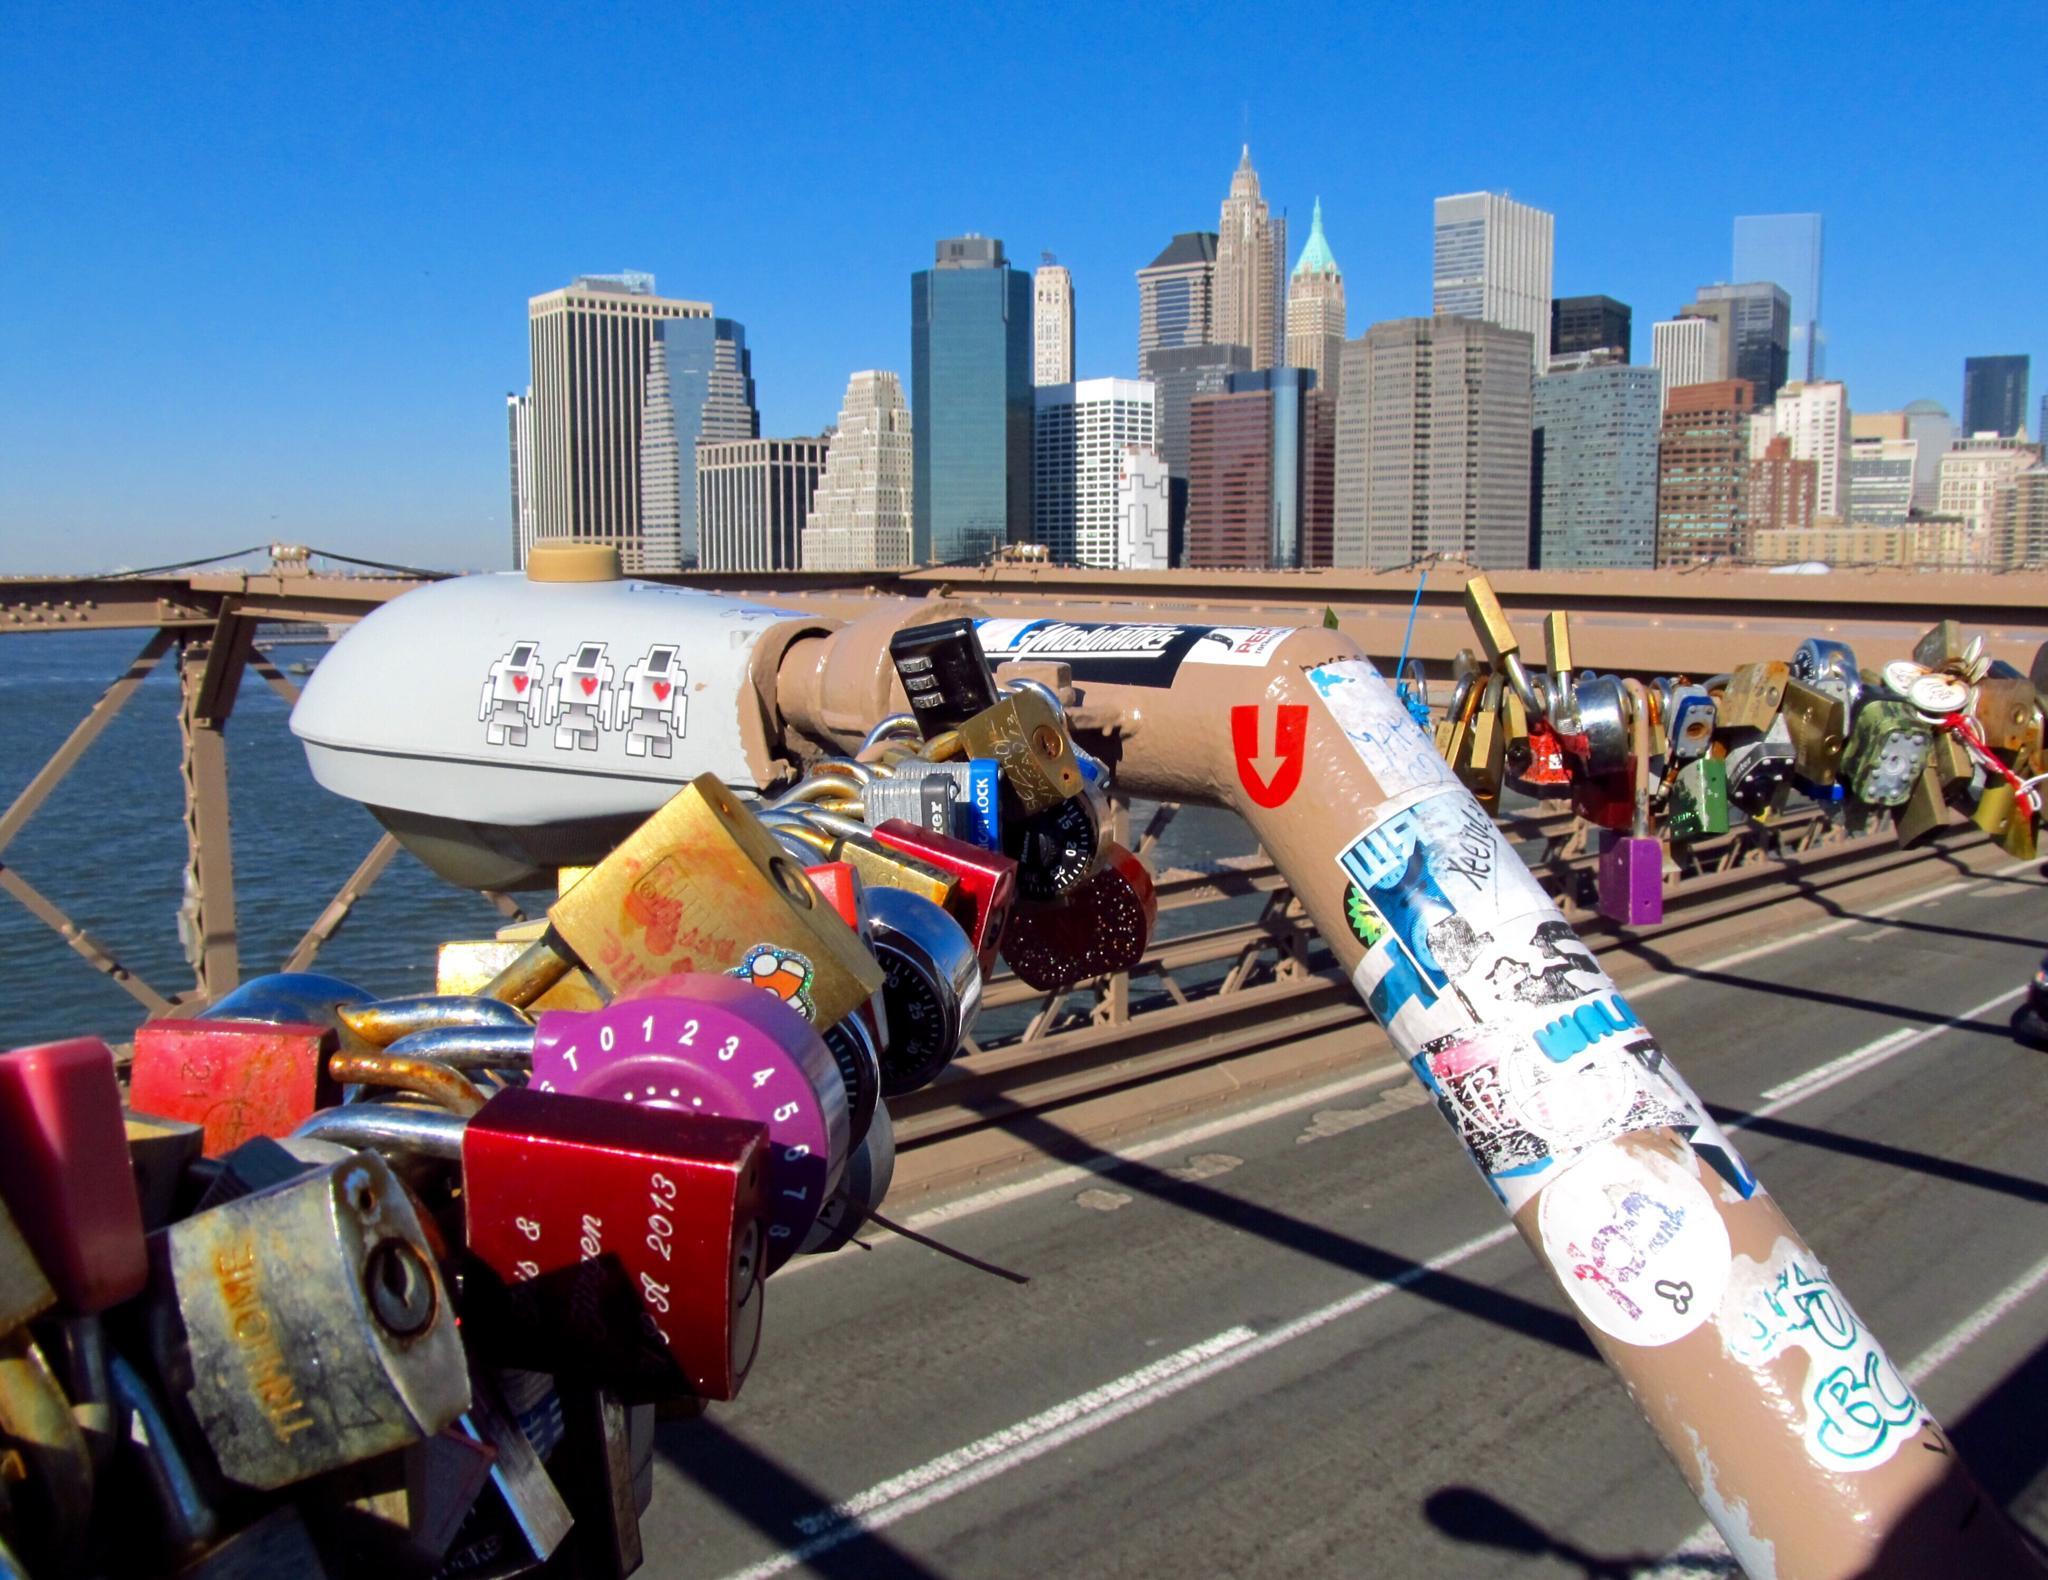 NYC Brooklyn Bridge by Harry Schäfer